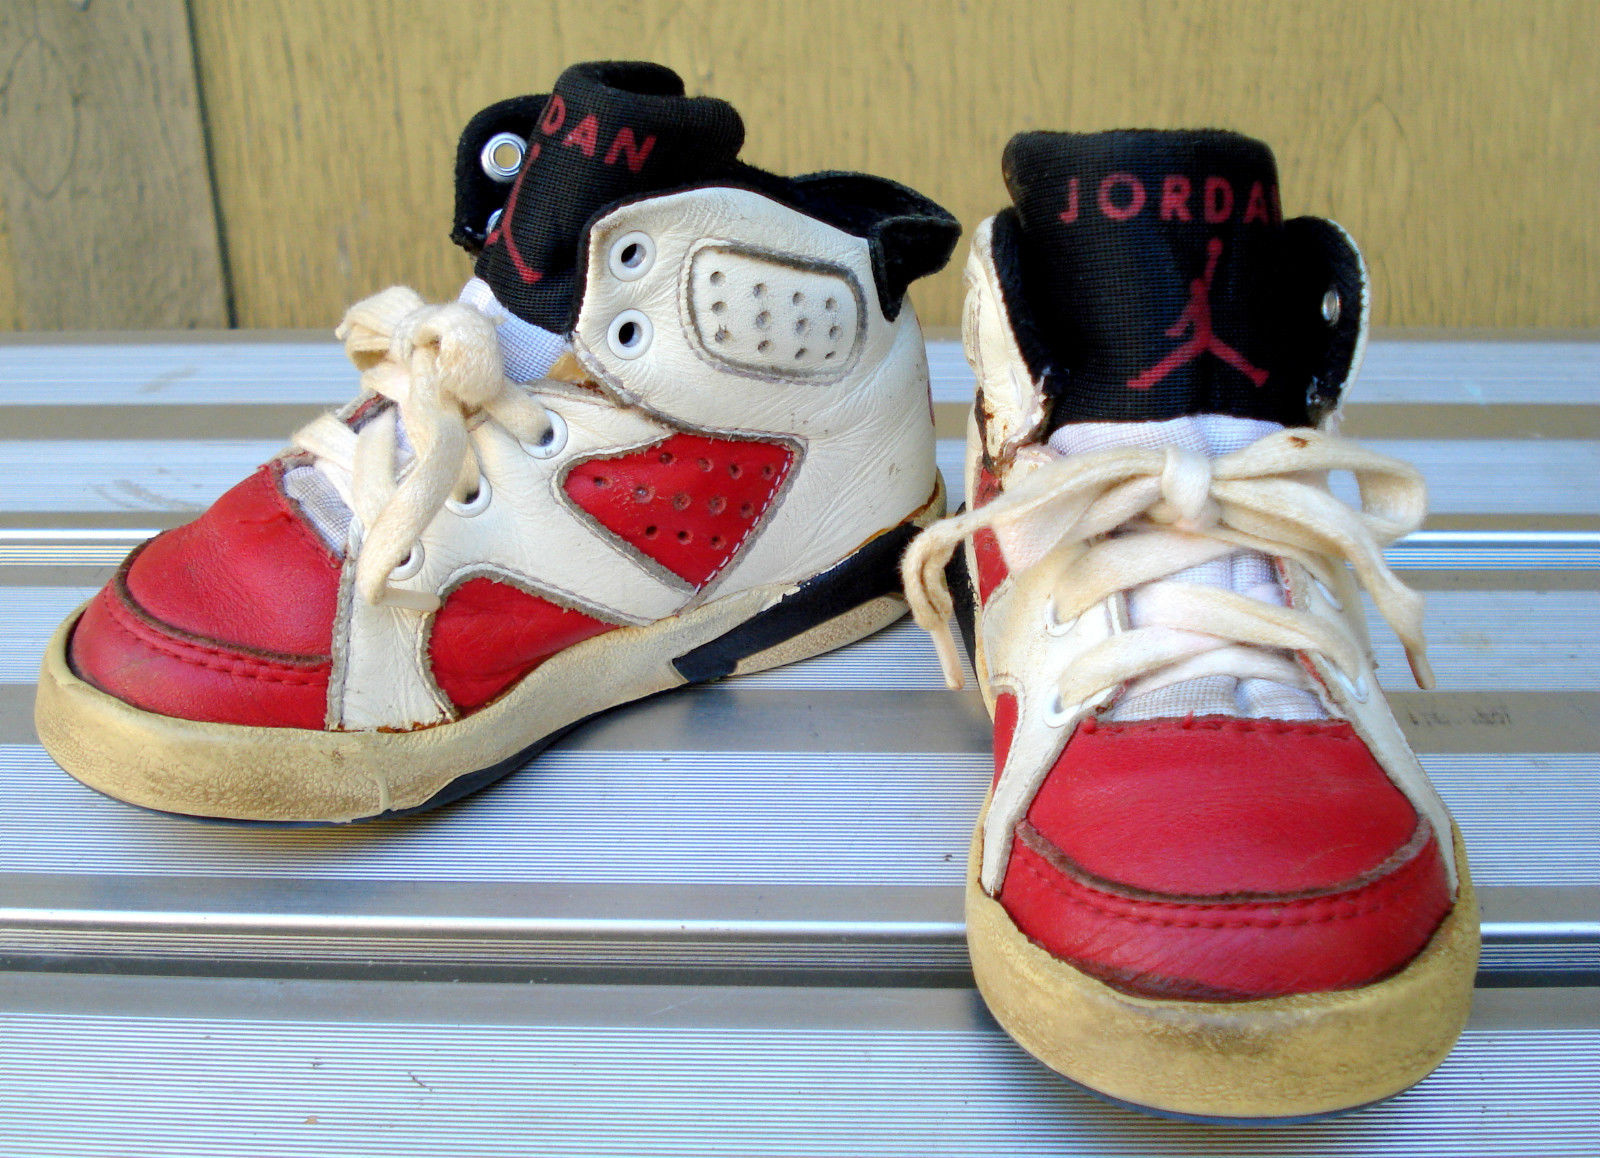 baby jordan basketball shoes